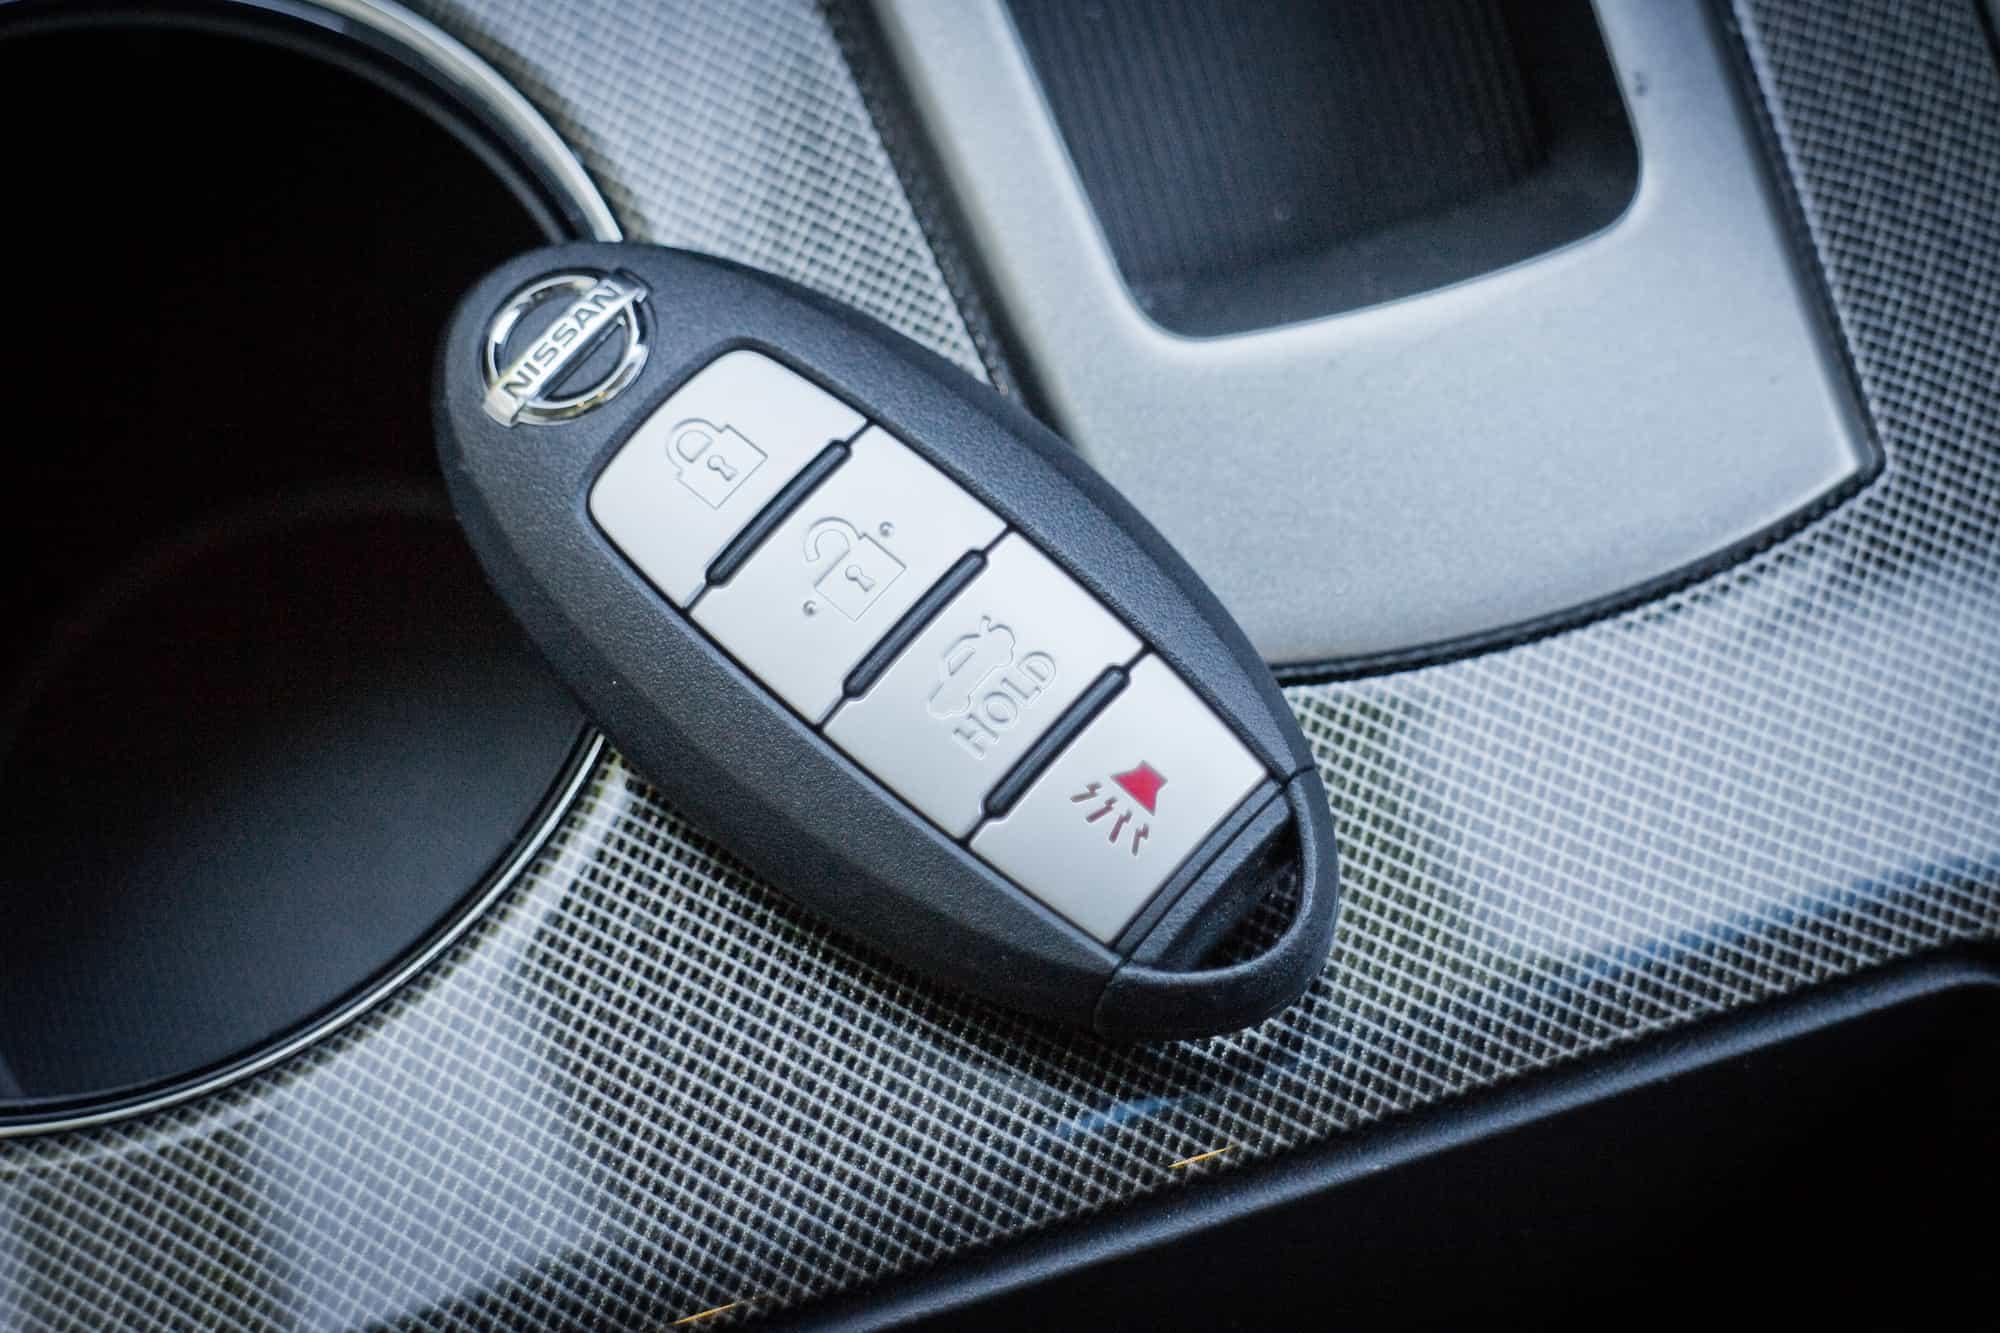 Nissan key fob inside a Nissan car